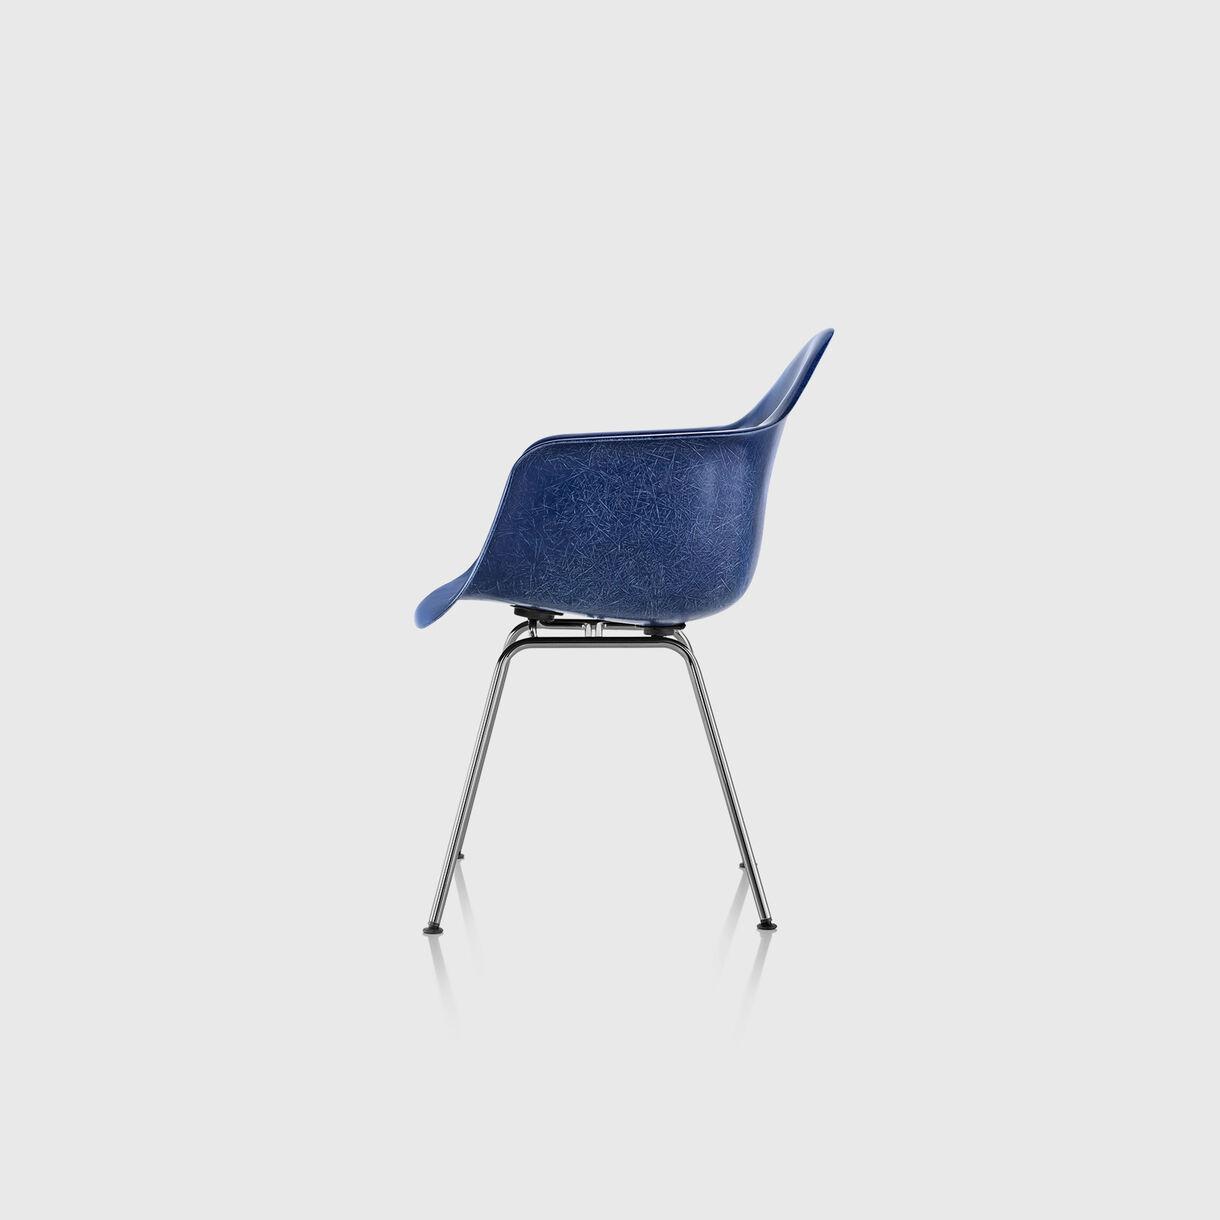 Eames Moulded Fibreglass Armchair, 4-Leg Base, Navy Blue